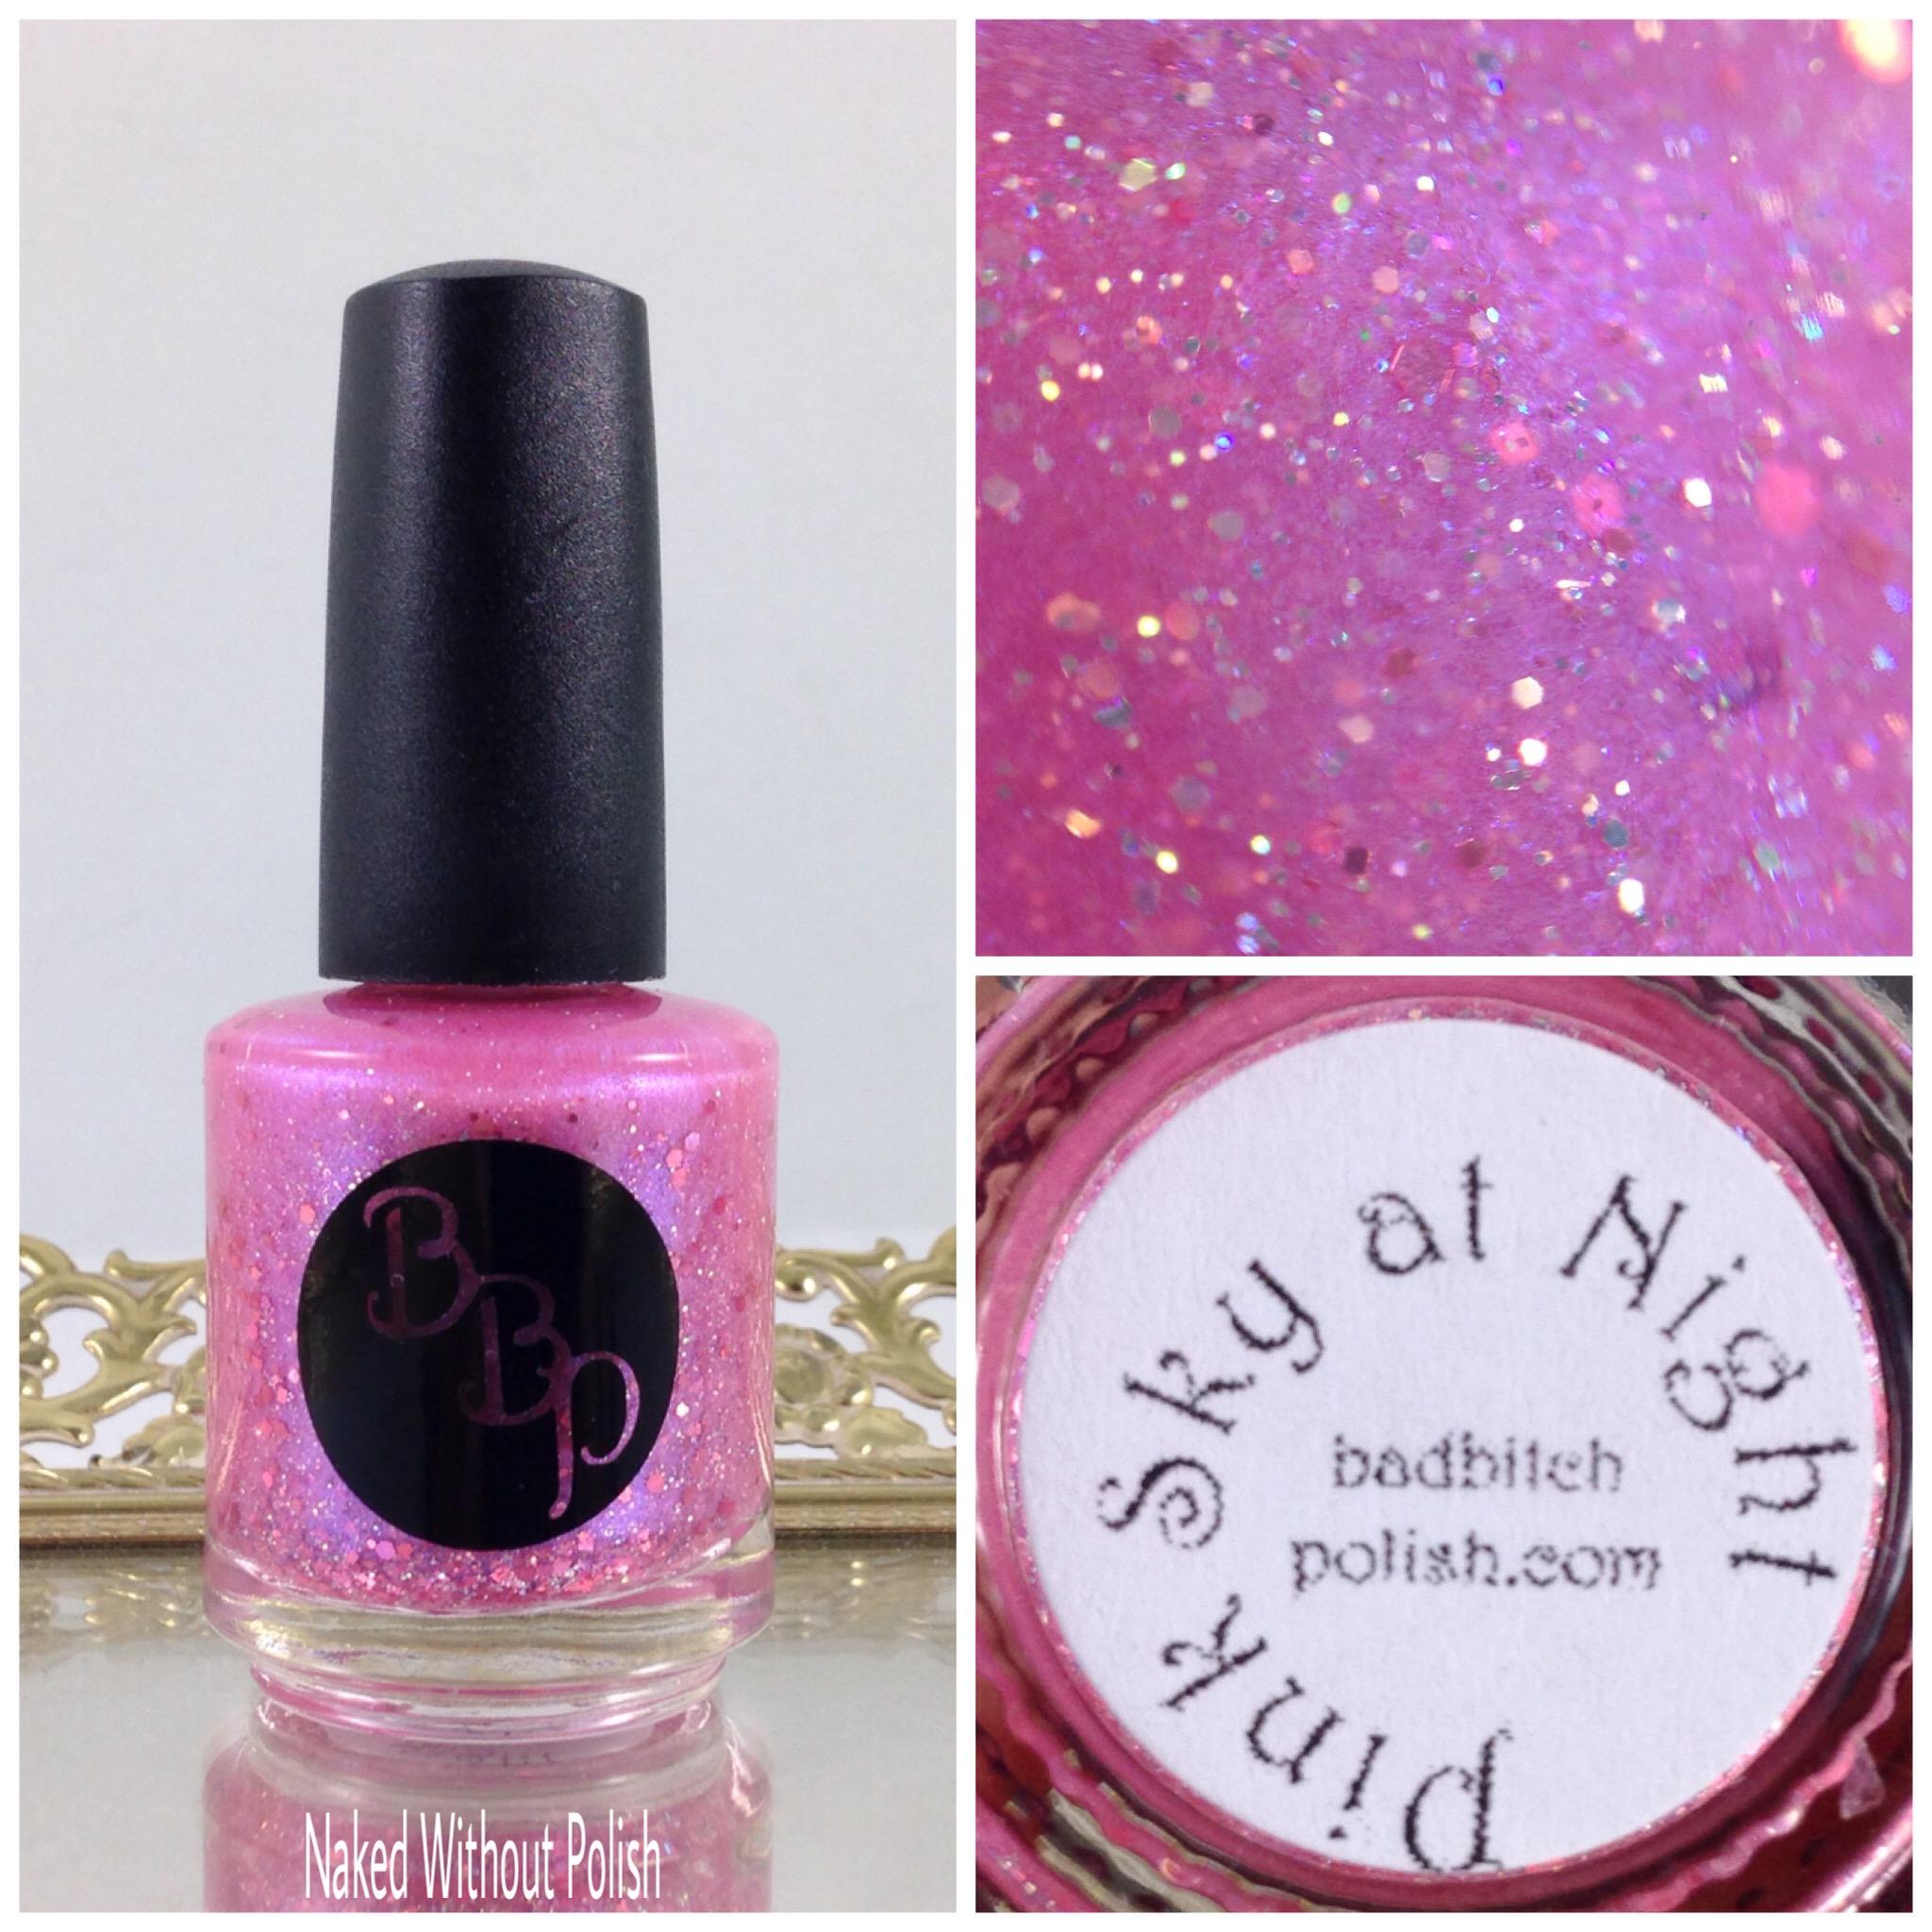 Bad-Bitch-Polish-Pink-Sky-at-Night-1